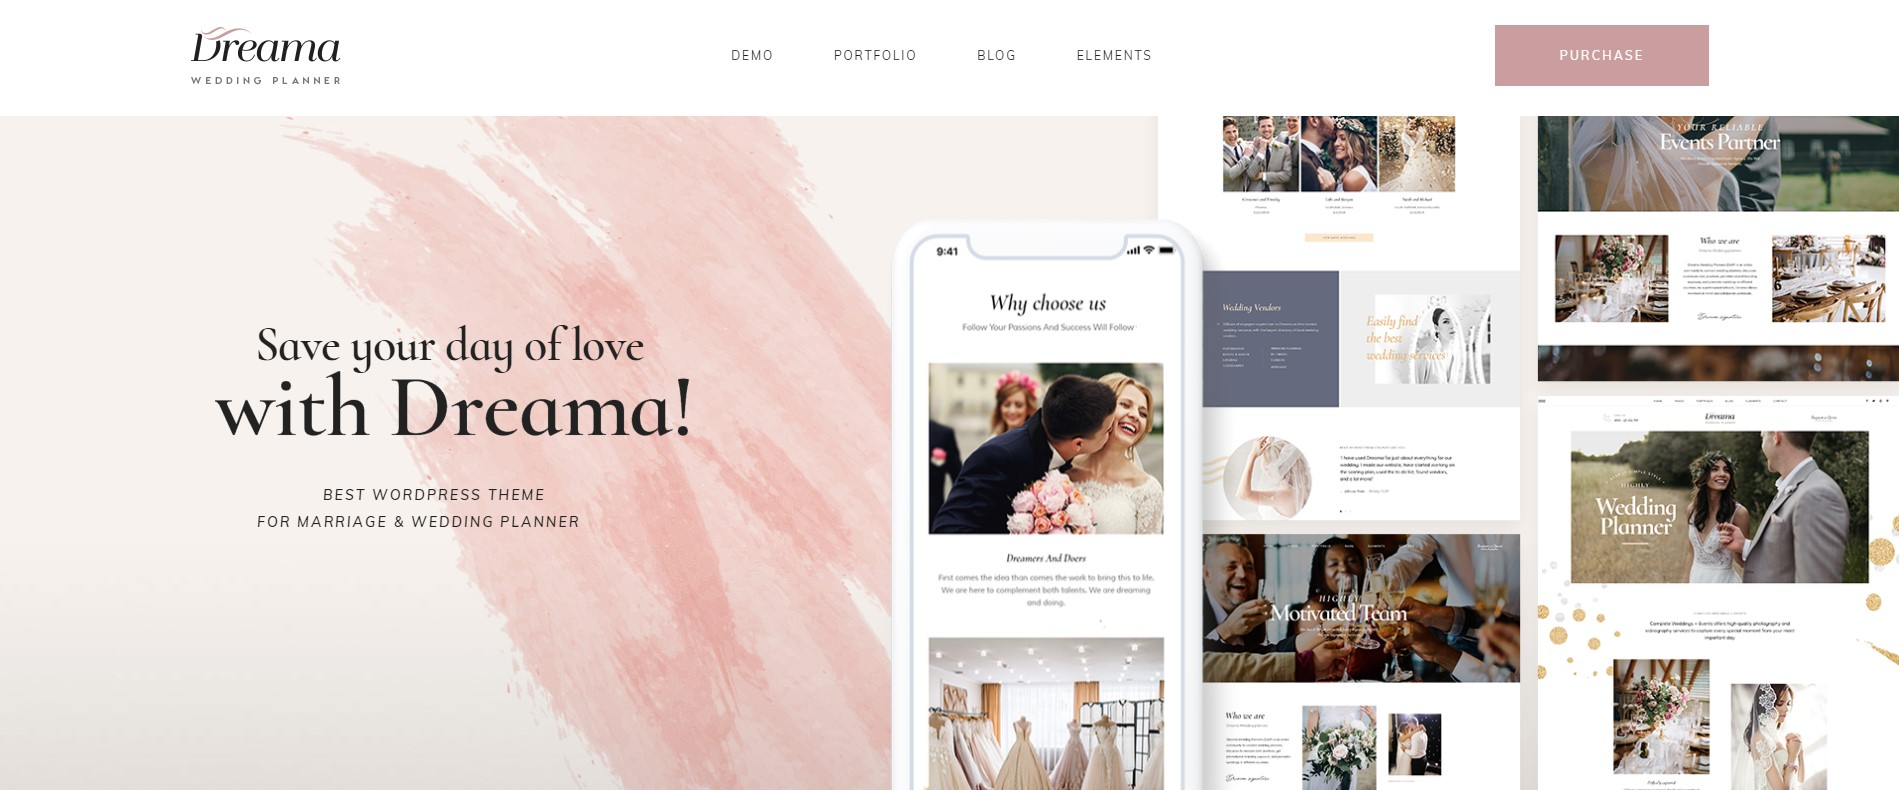 Dreama - Engagement & Wedding Shop WordPress Theme | Premium & Responsive